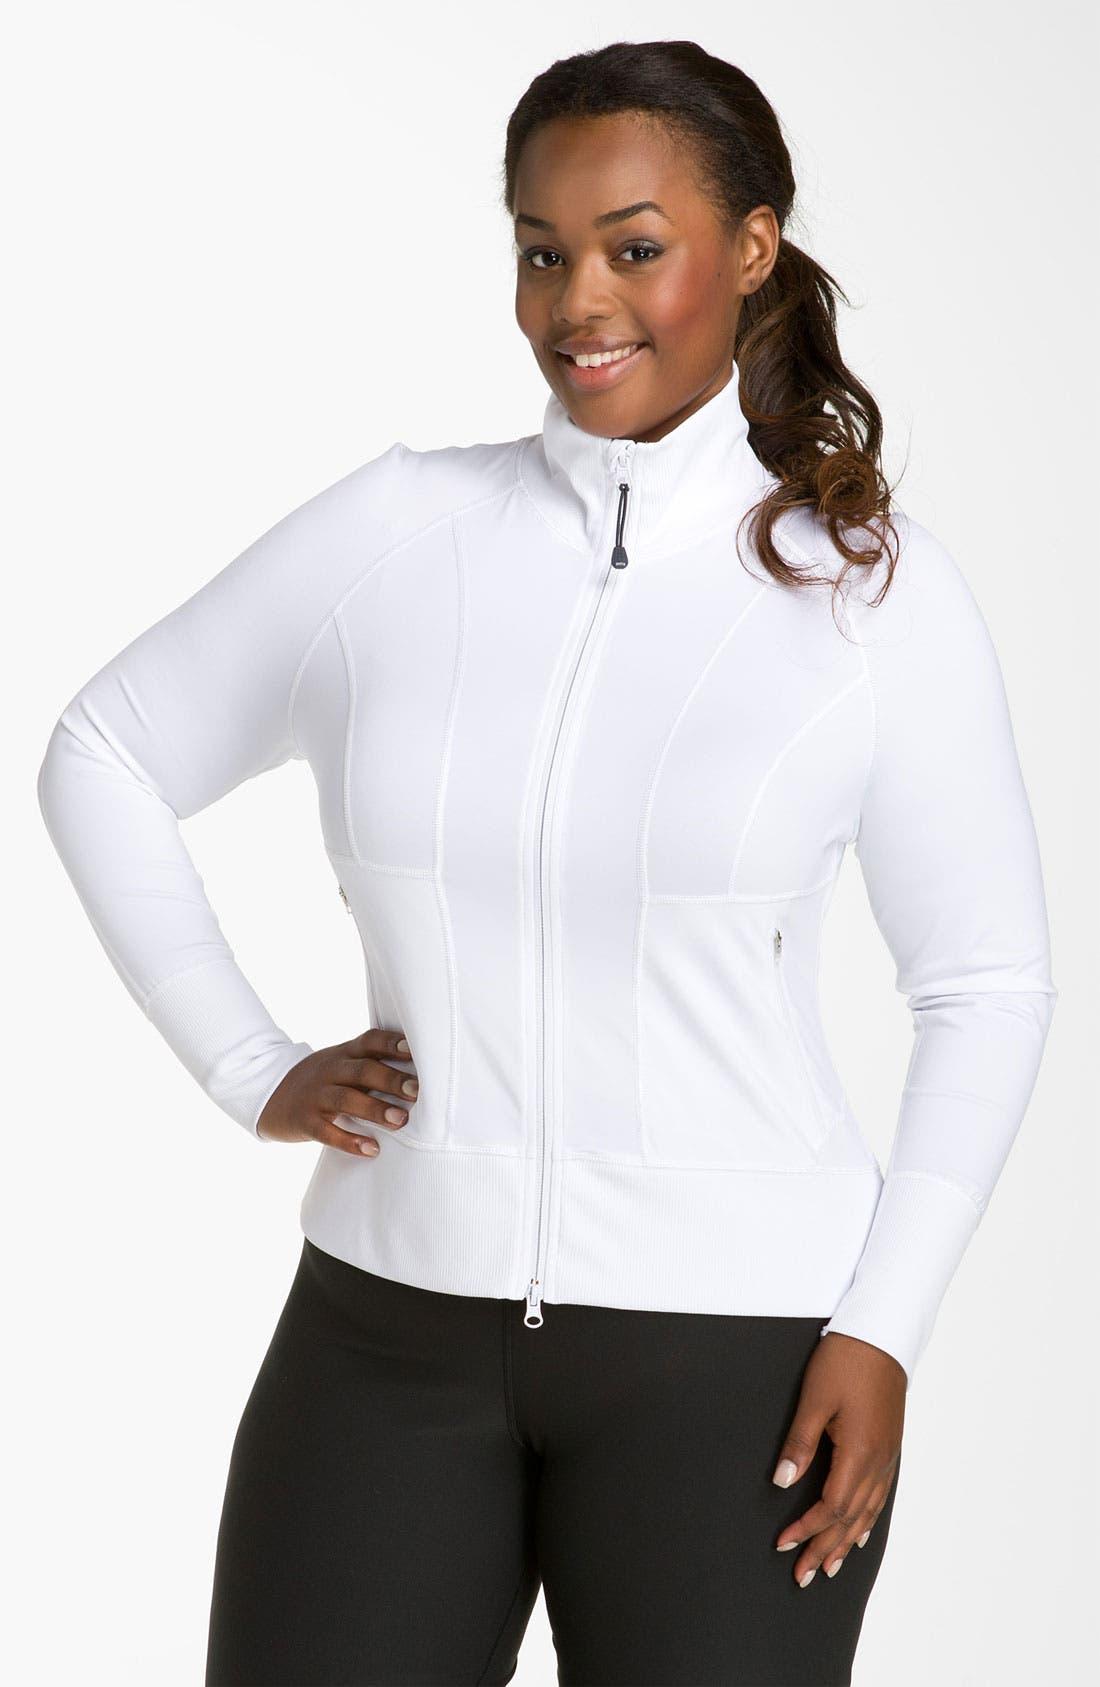 Alternate Image 1 Selected - Zella 'No. 1 Sport' Jacket (Plus)